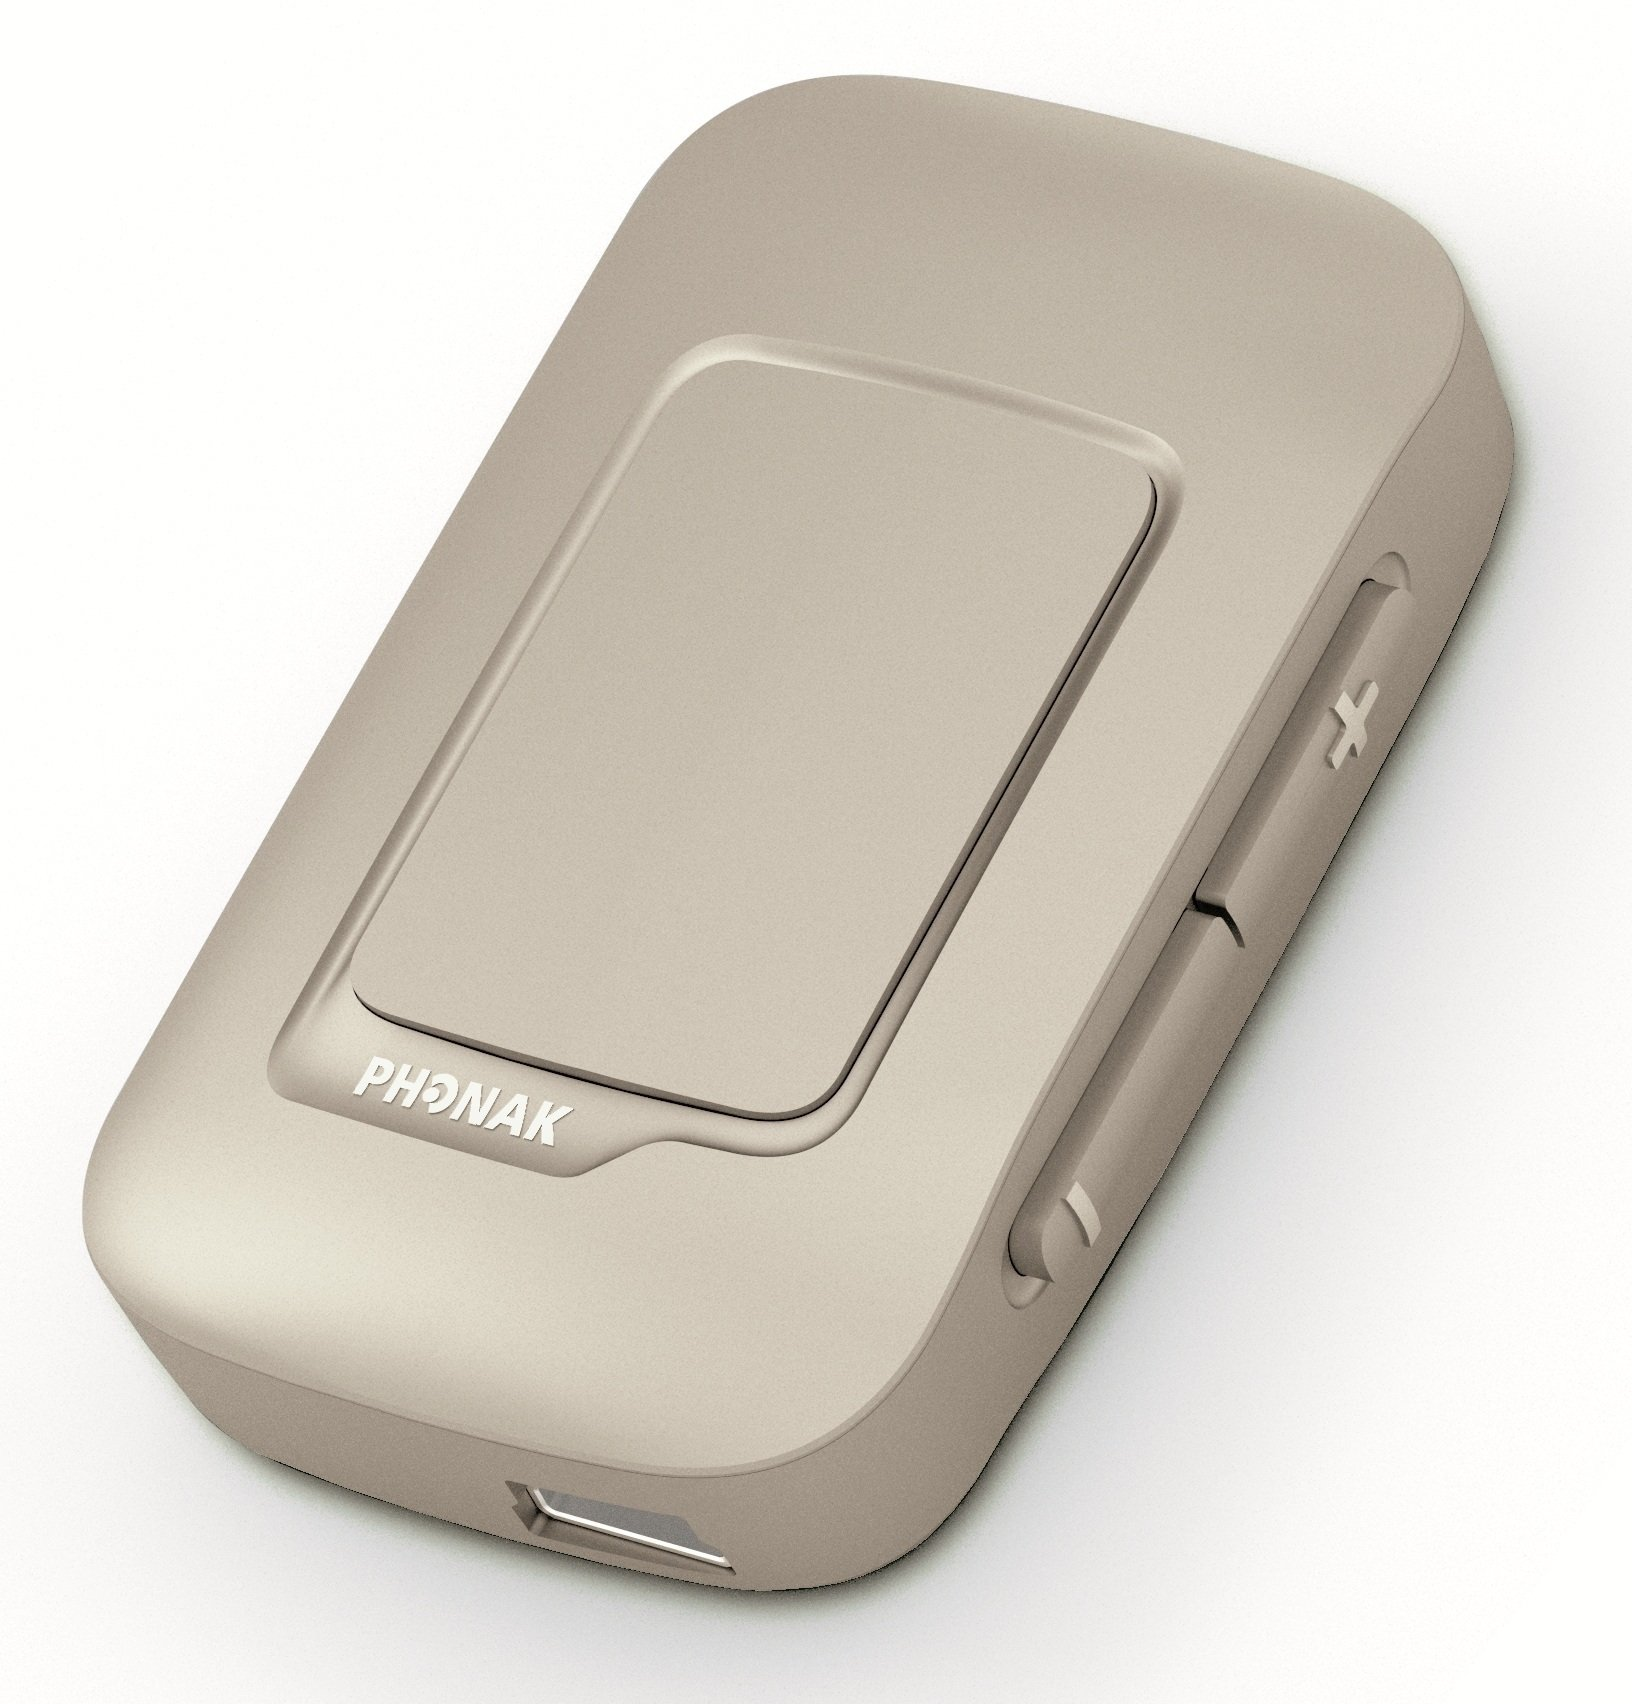 Phonak ComPilot Air II for the Venture Series Hearing Aids